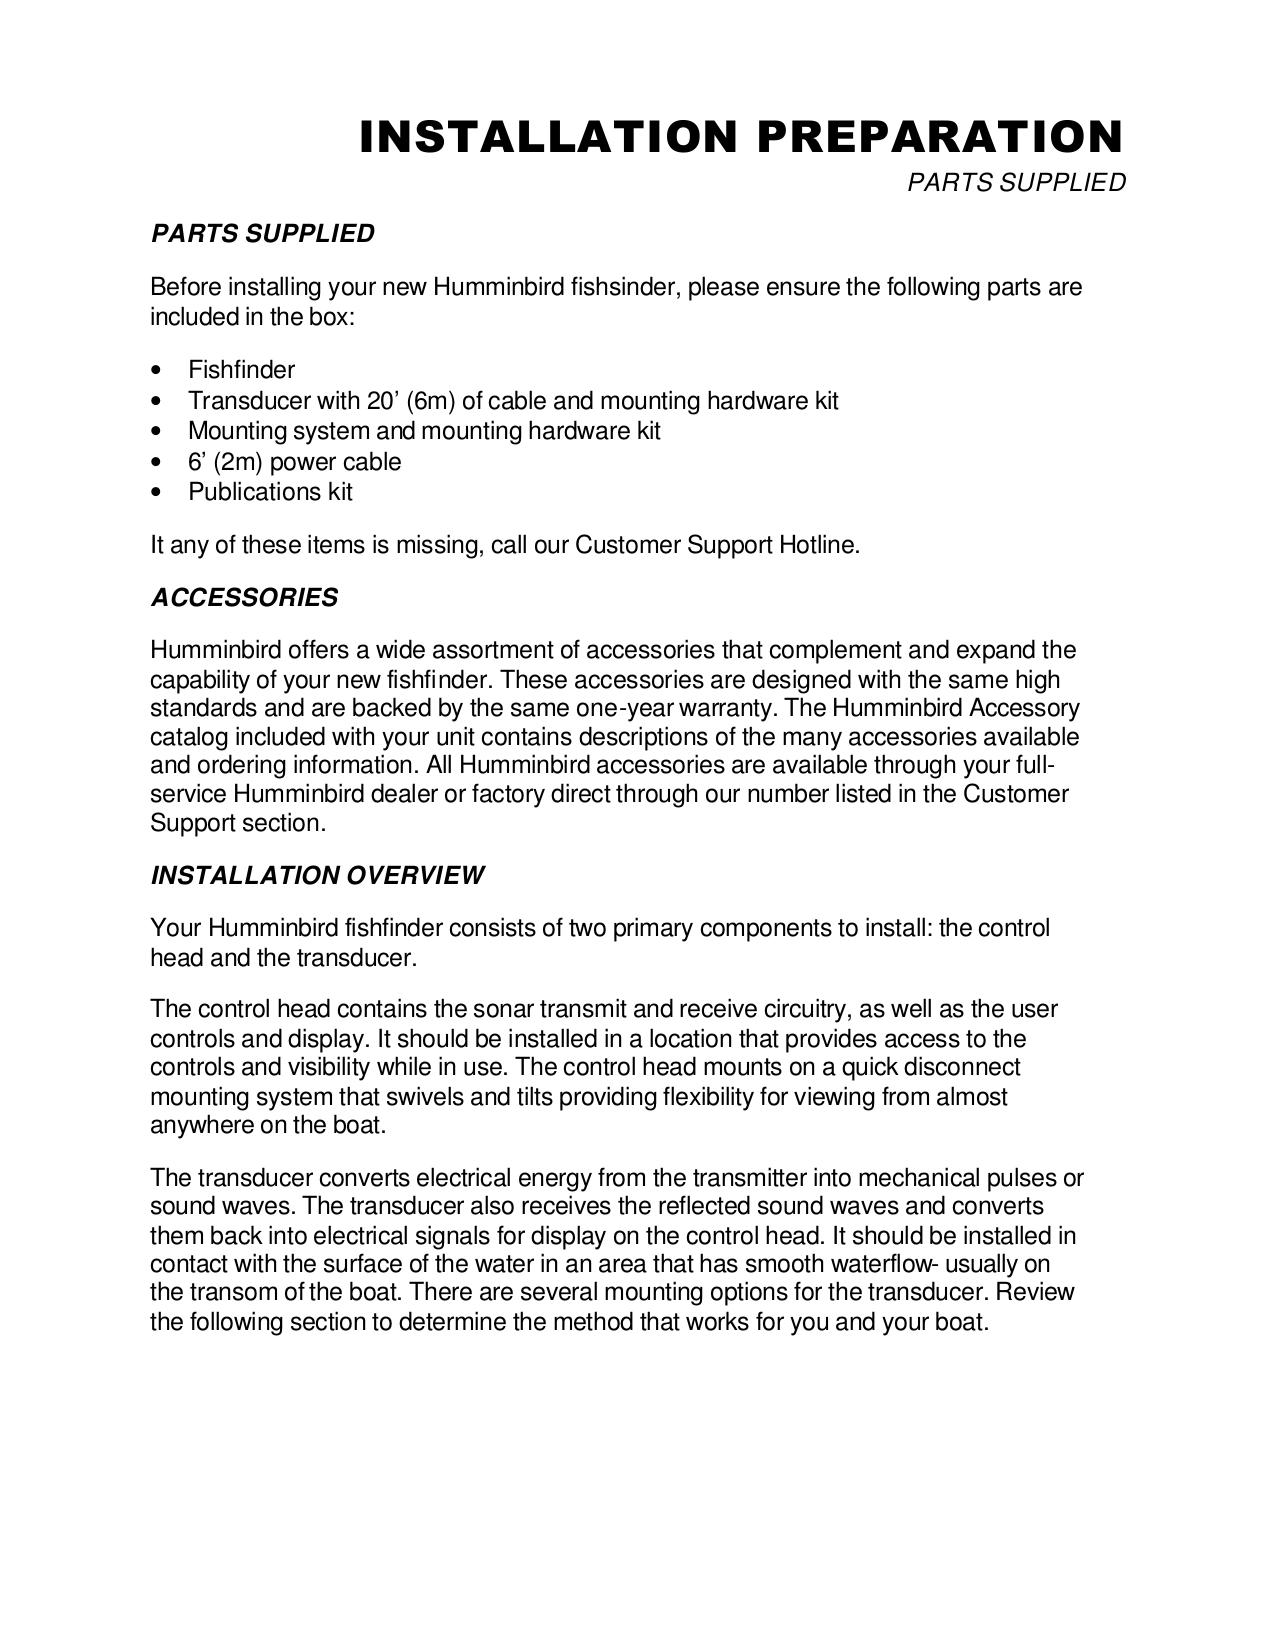 pdf for Humminbird GPS 365i manual